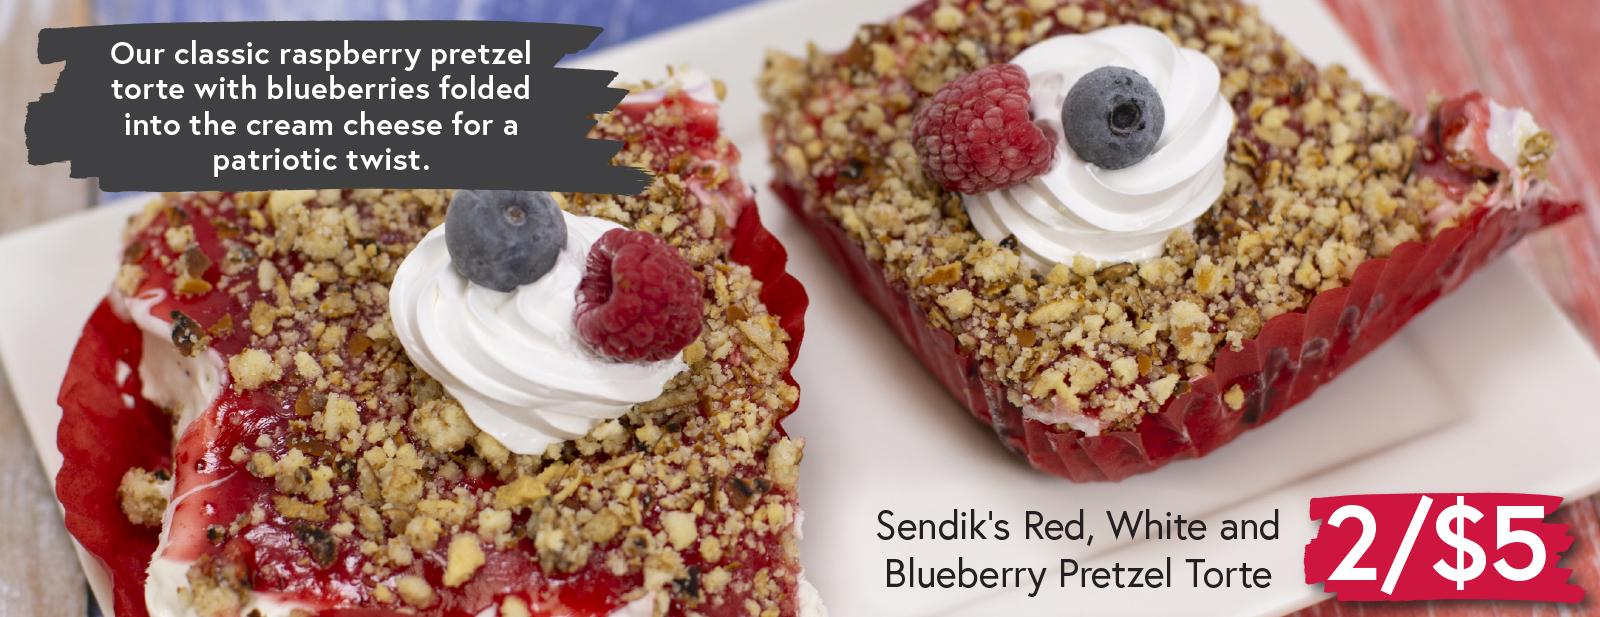 Sendik's Red, White and Blueberry Pretzel Tortes 2/$5